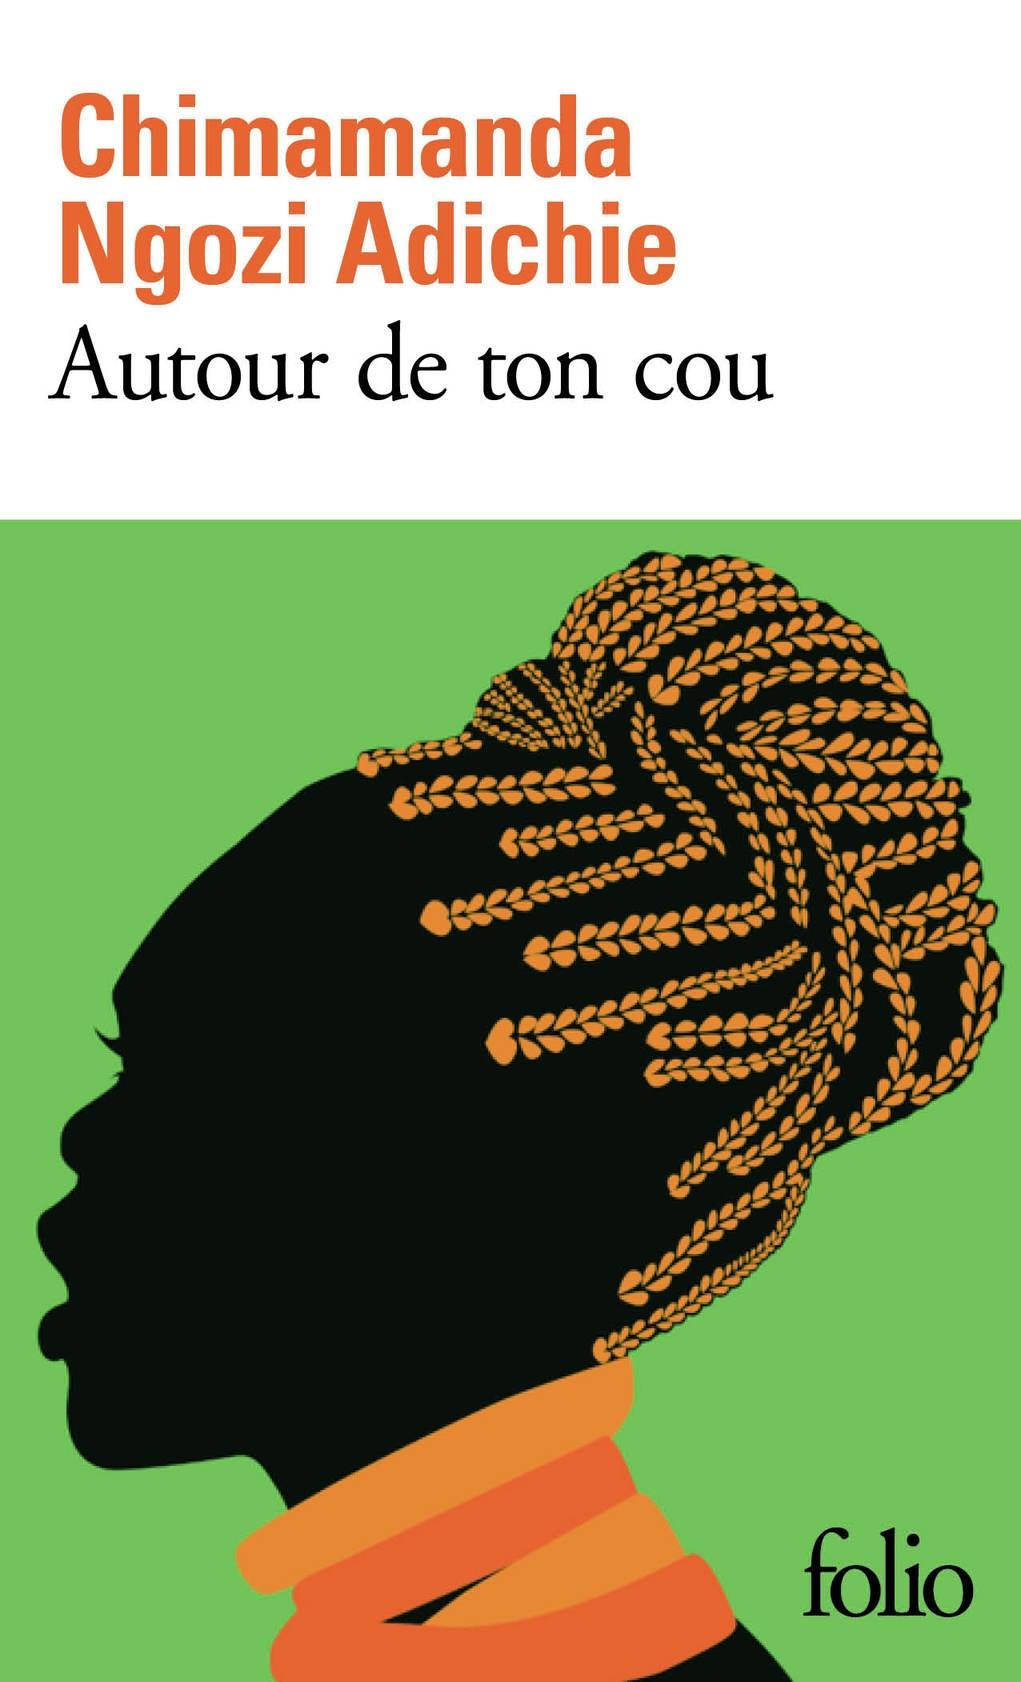 Autour de ton cou | Adichie, Chimamanda Ngozi